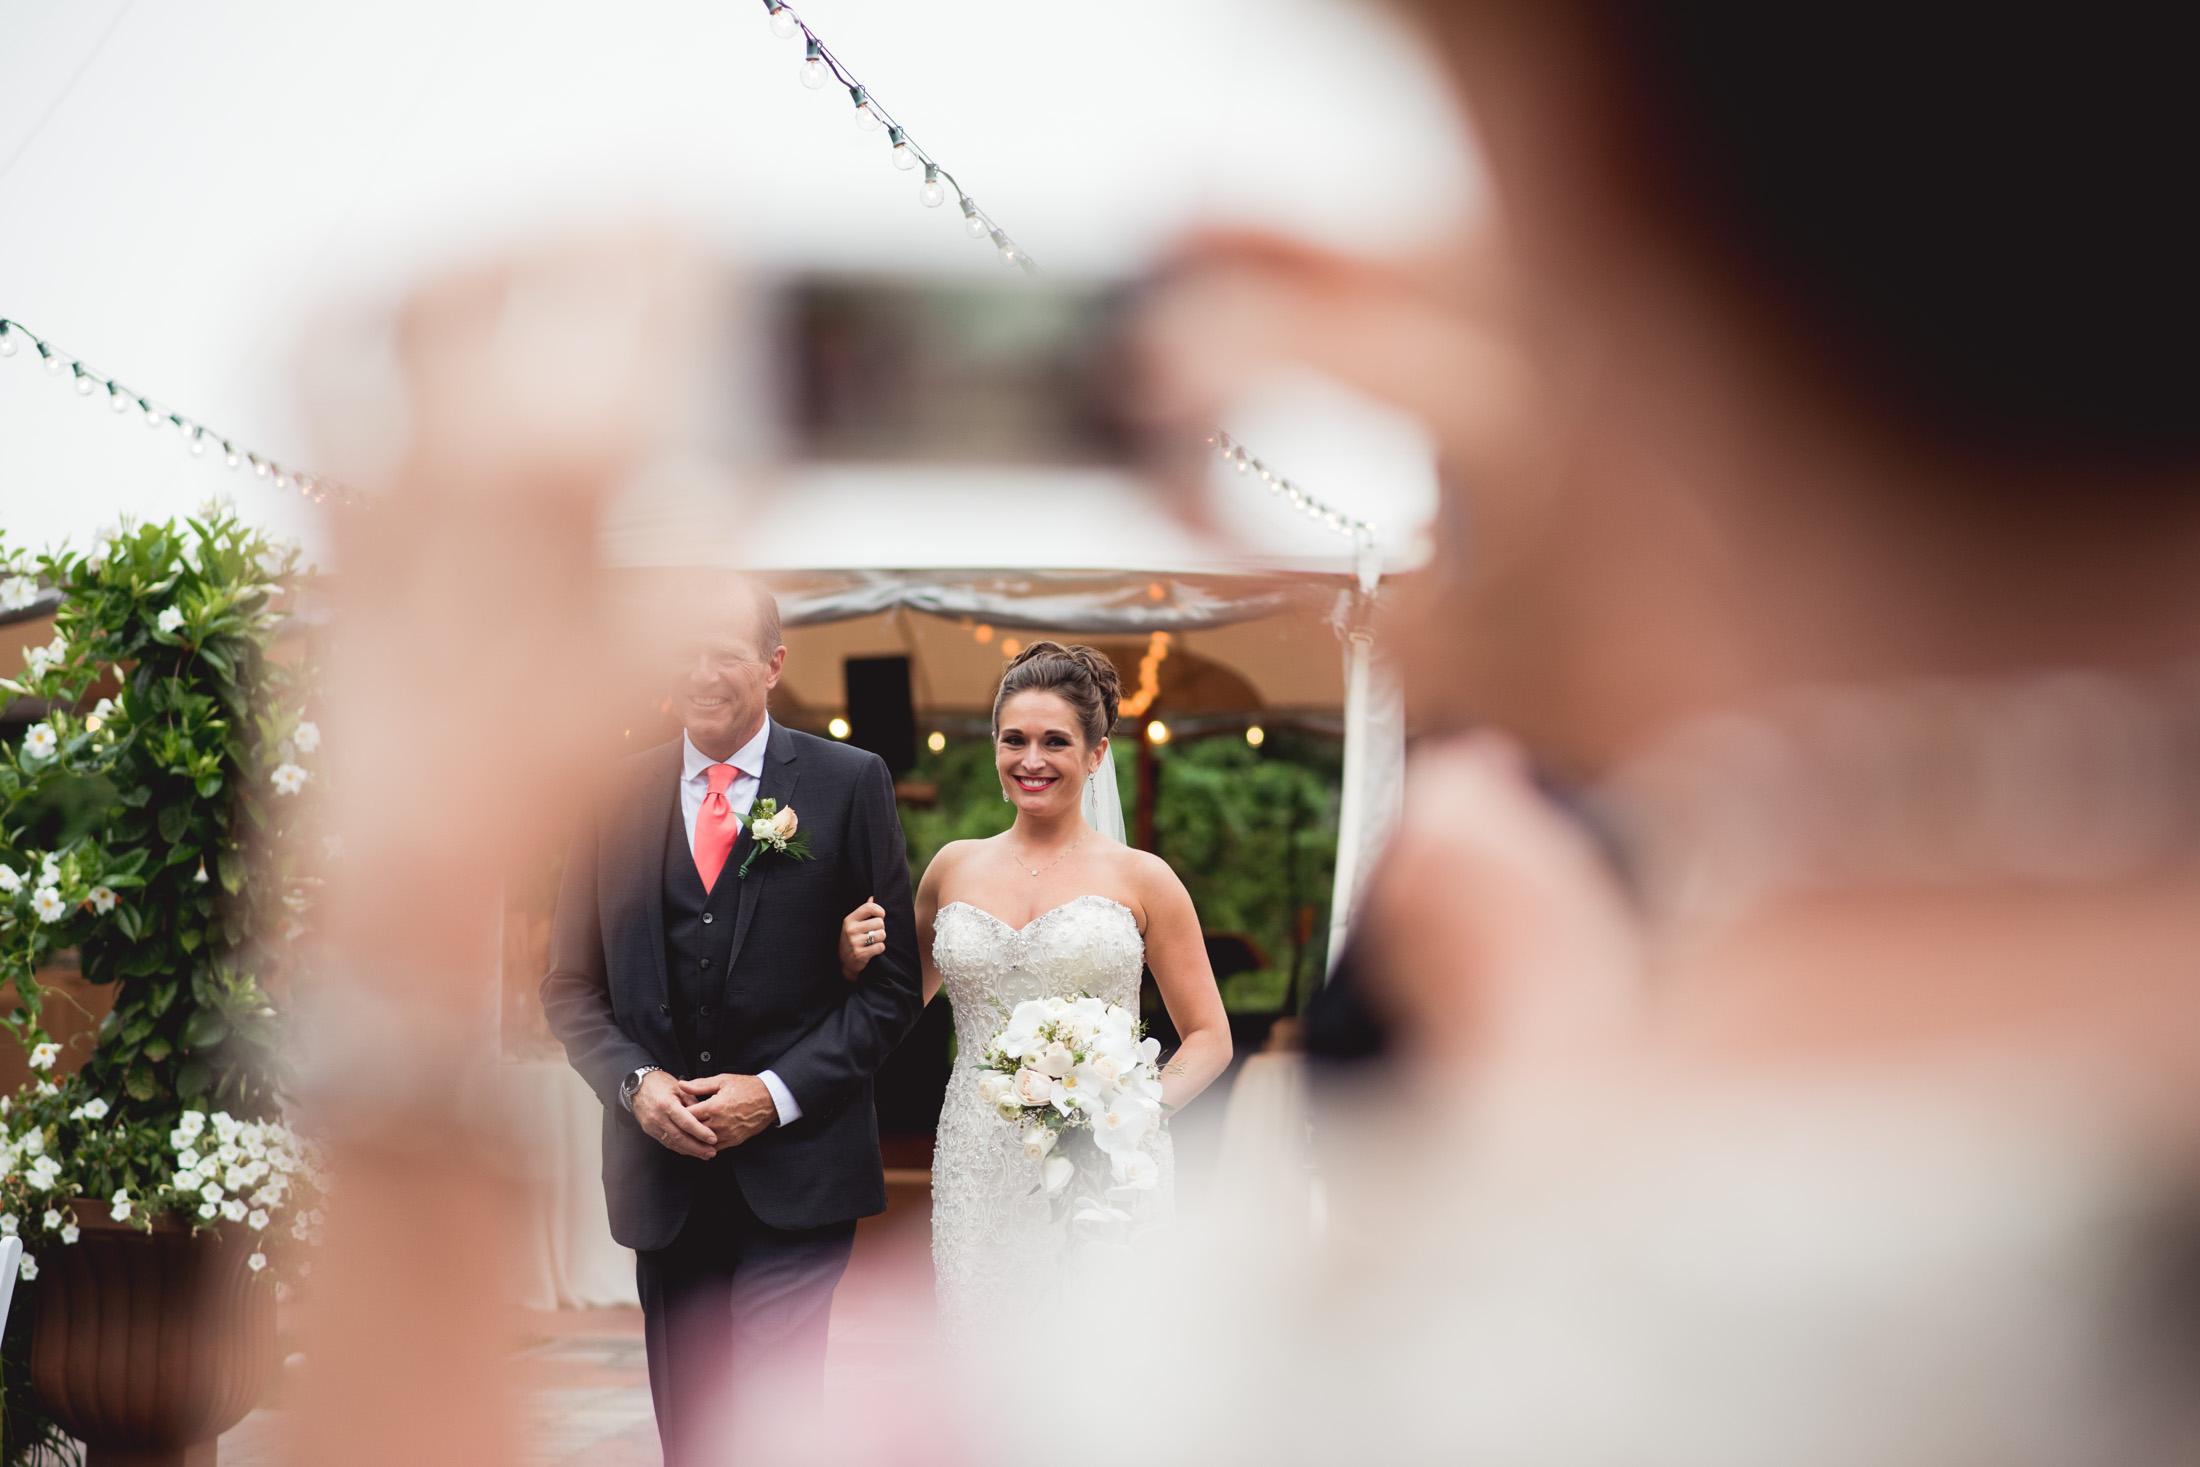 Willowdale-wedding-photography-14.jpg